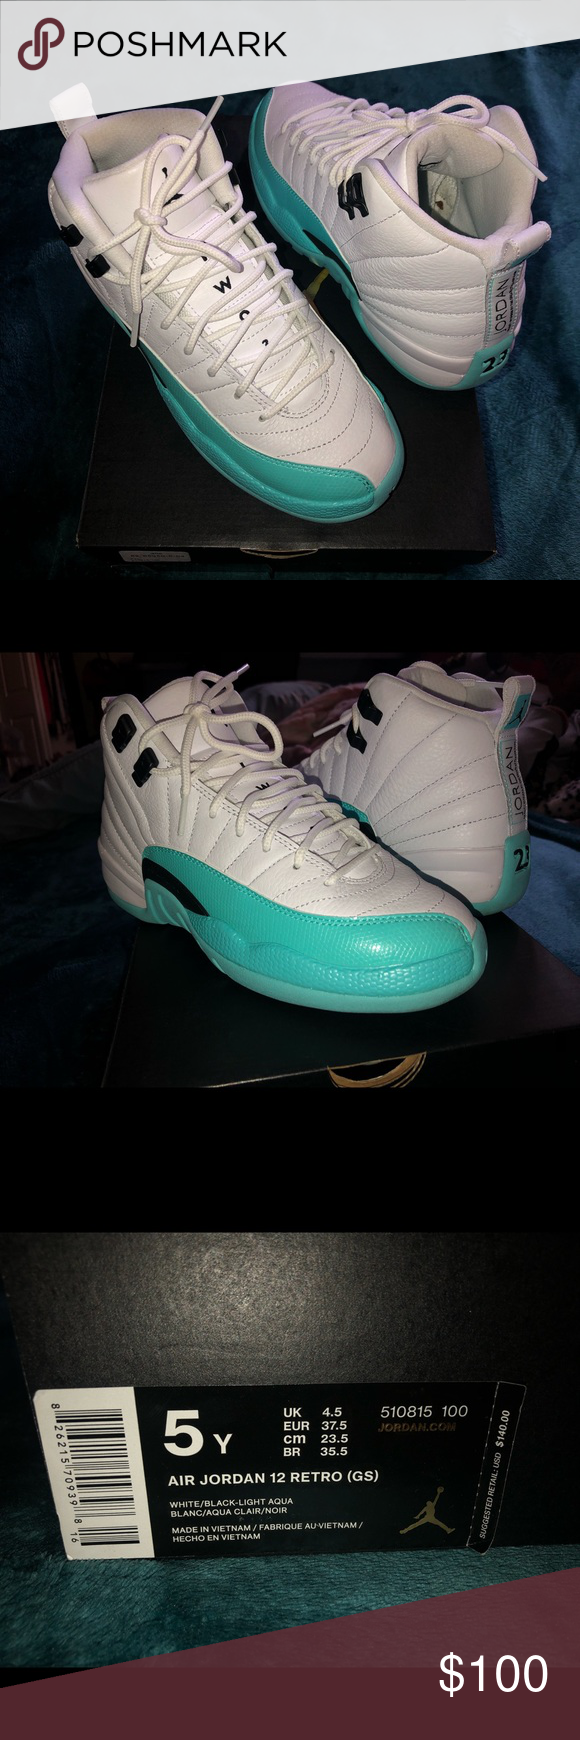 7293fa7f28a8 Air Jordan 12 Retro Light-Aqua and white Air Jordan 12 BRAND NEW! Size 5y  Jordan Shoes Sneakers